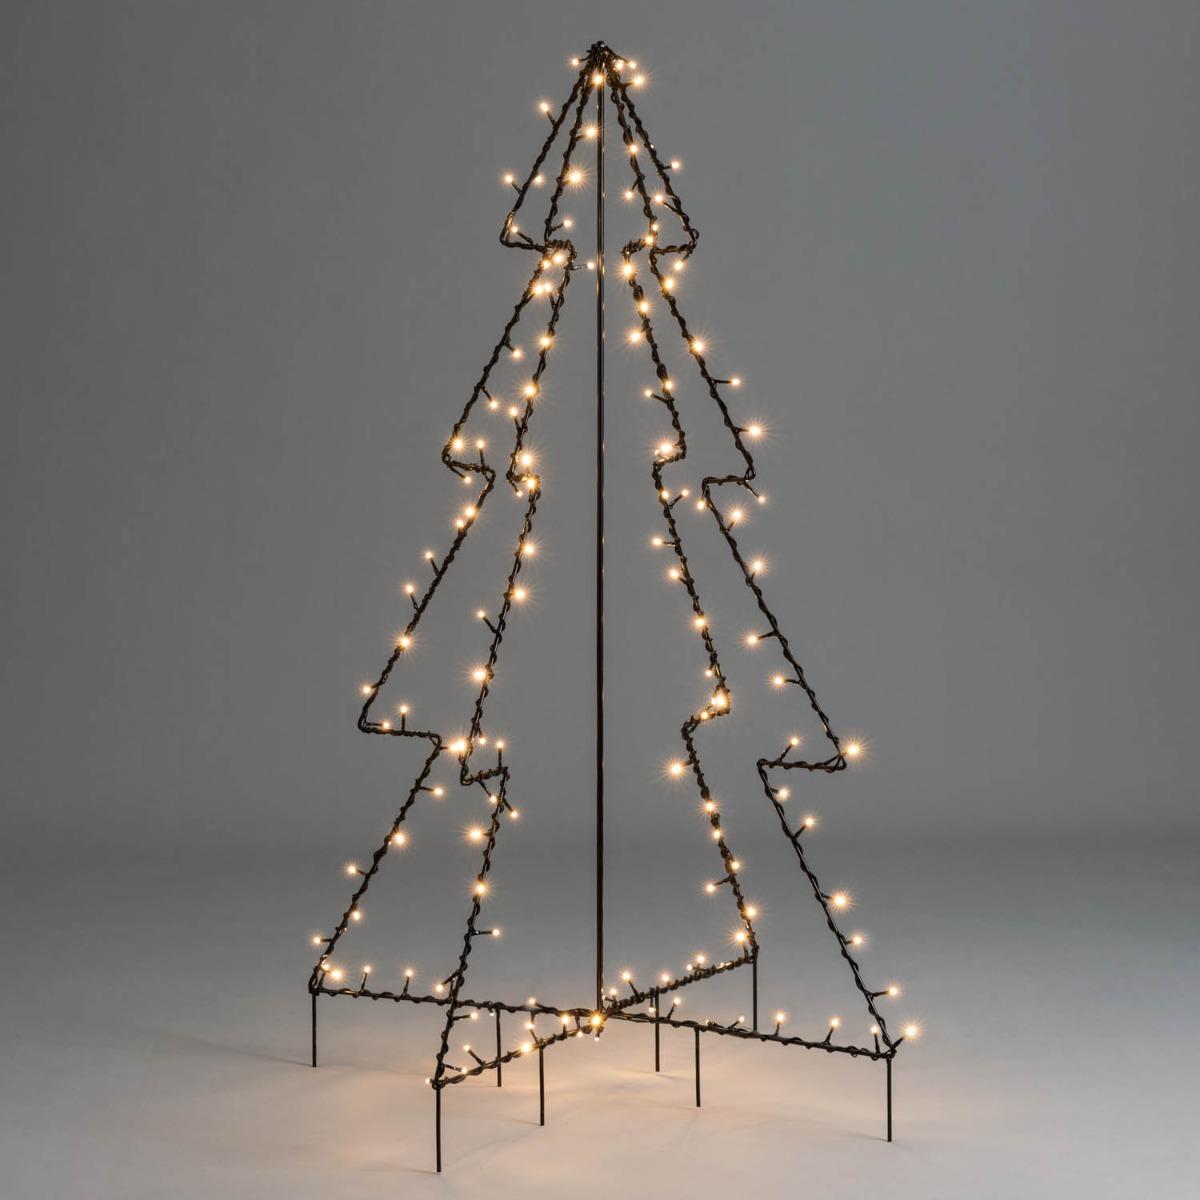 Image of Black Silhouette Christmas Tree 4ft